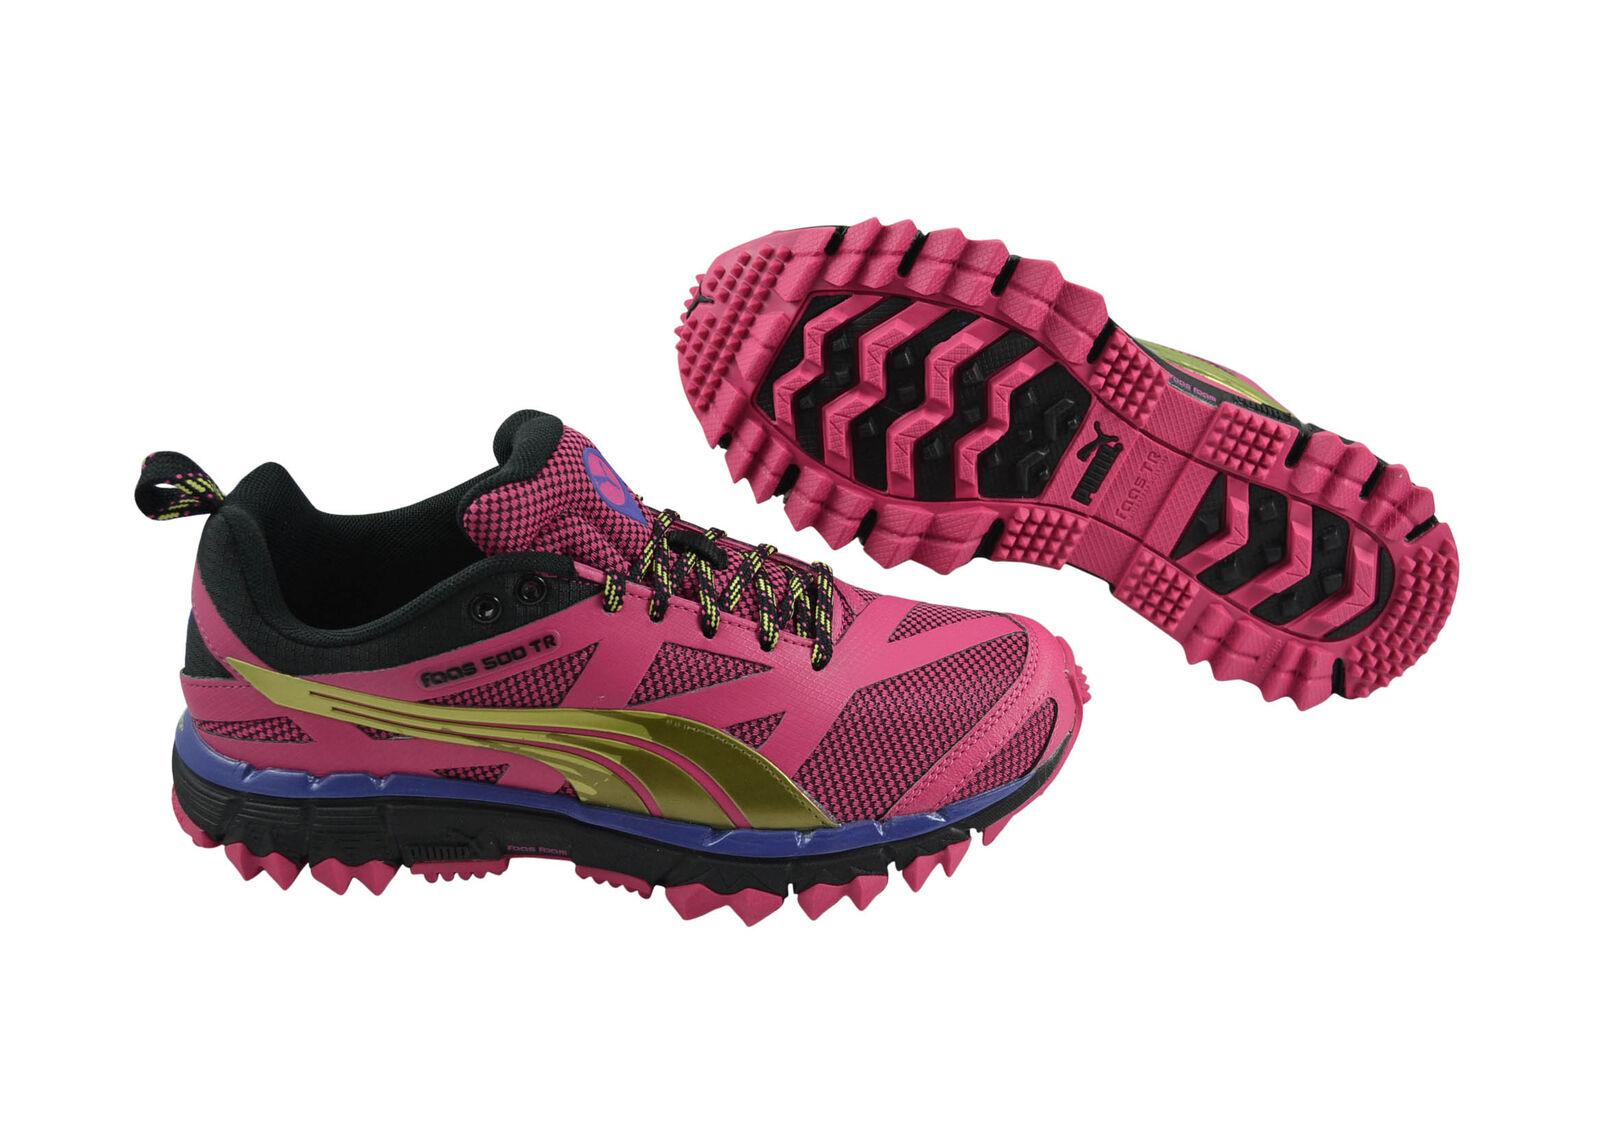 Puma Faas 500 TR Wn's purple black Trekkingschuhe Laufschuhe 304597 04 pink